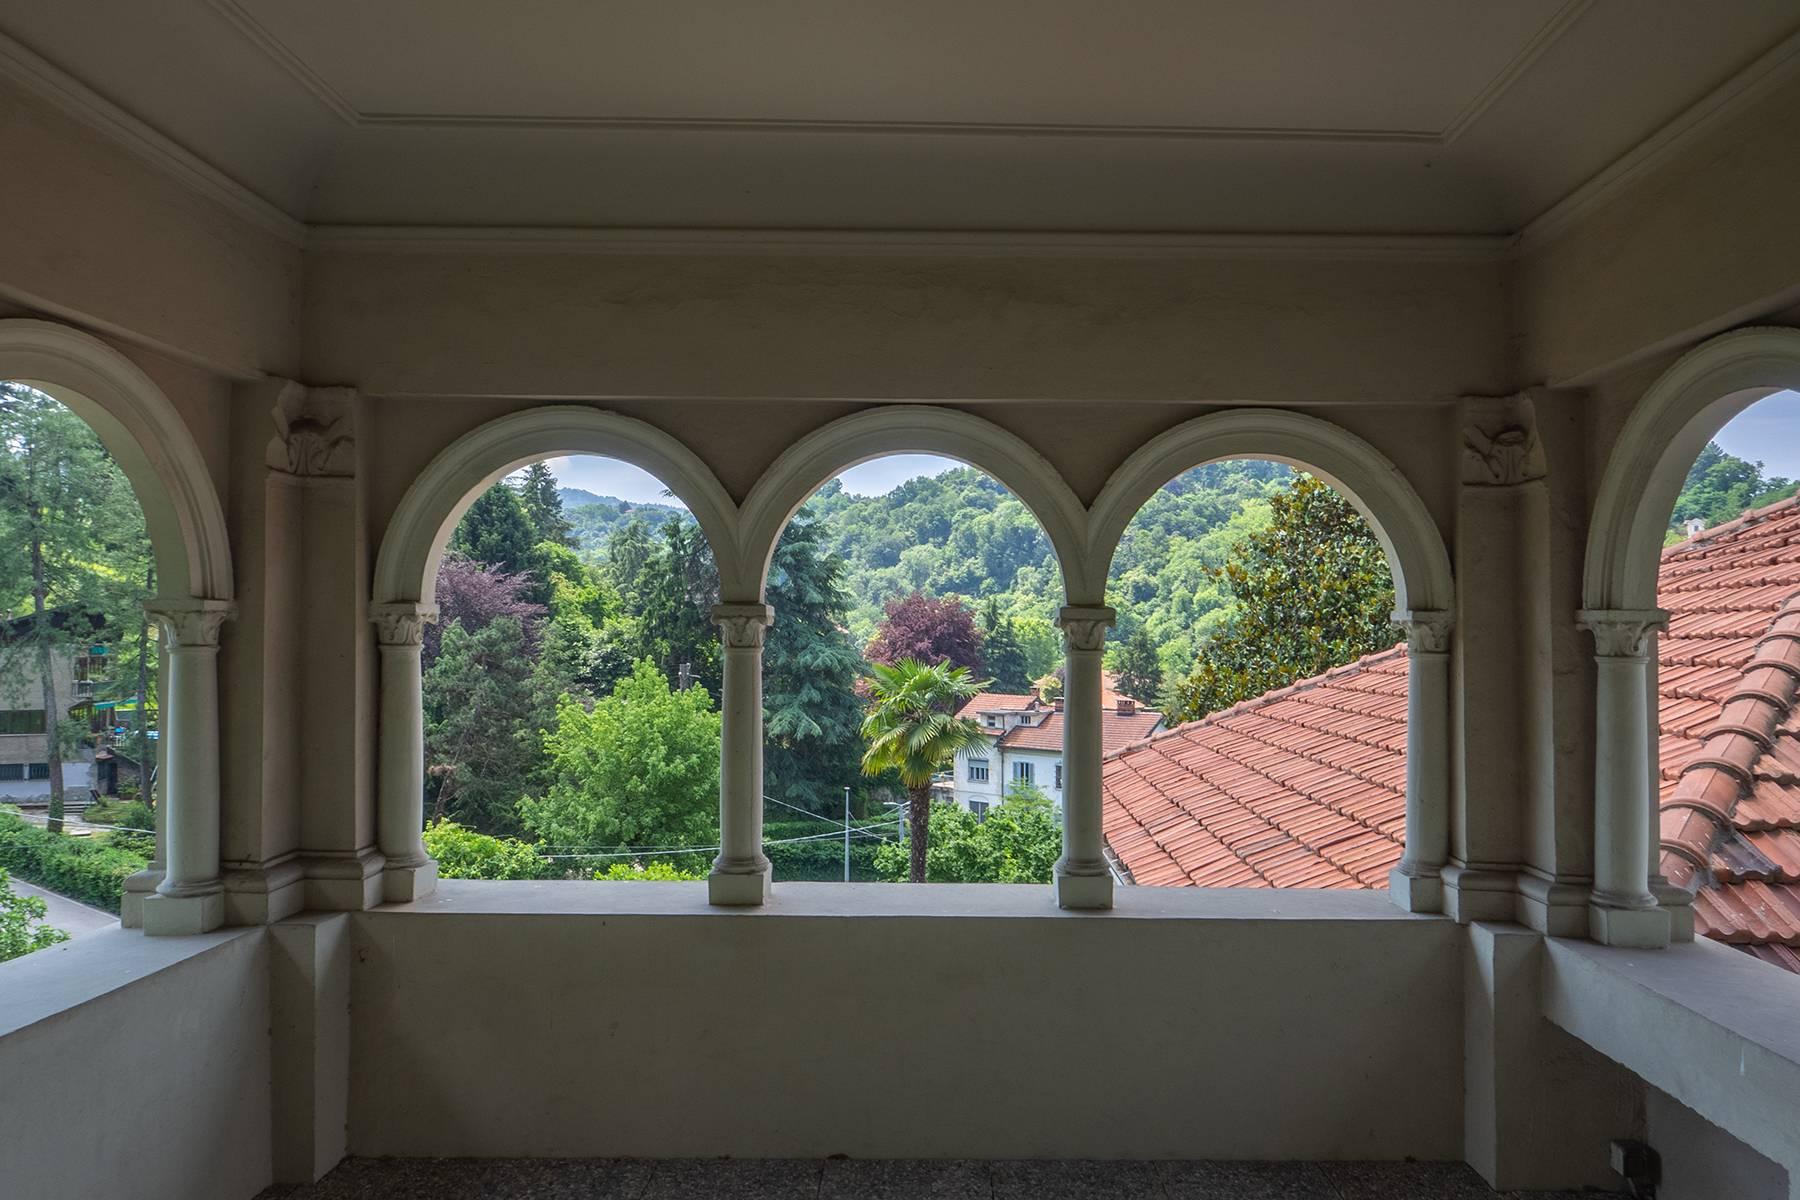 Casa indipendente in Vendita a Torino: 5 locali, 657 mq - Foto 18